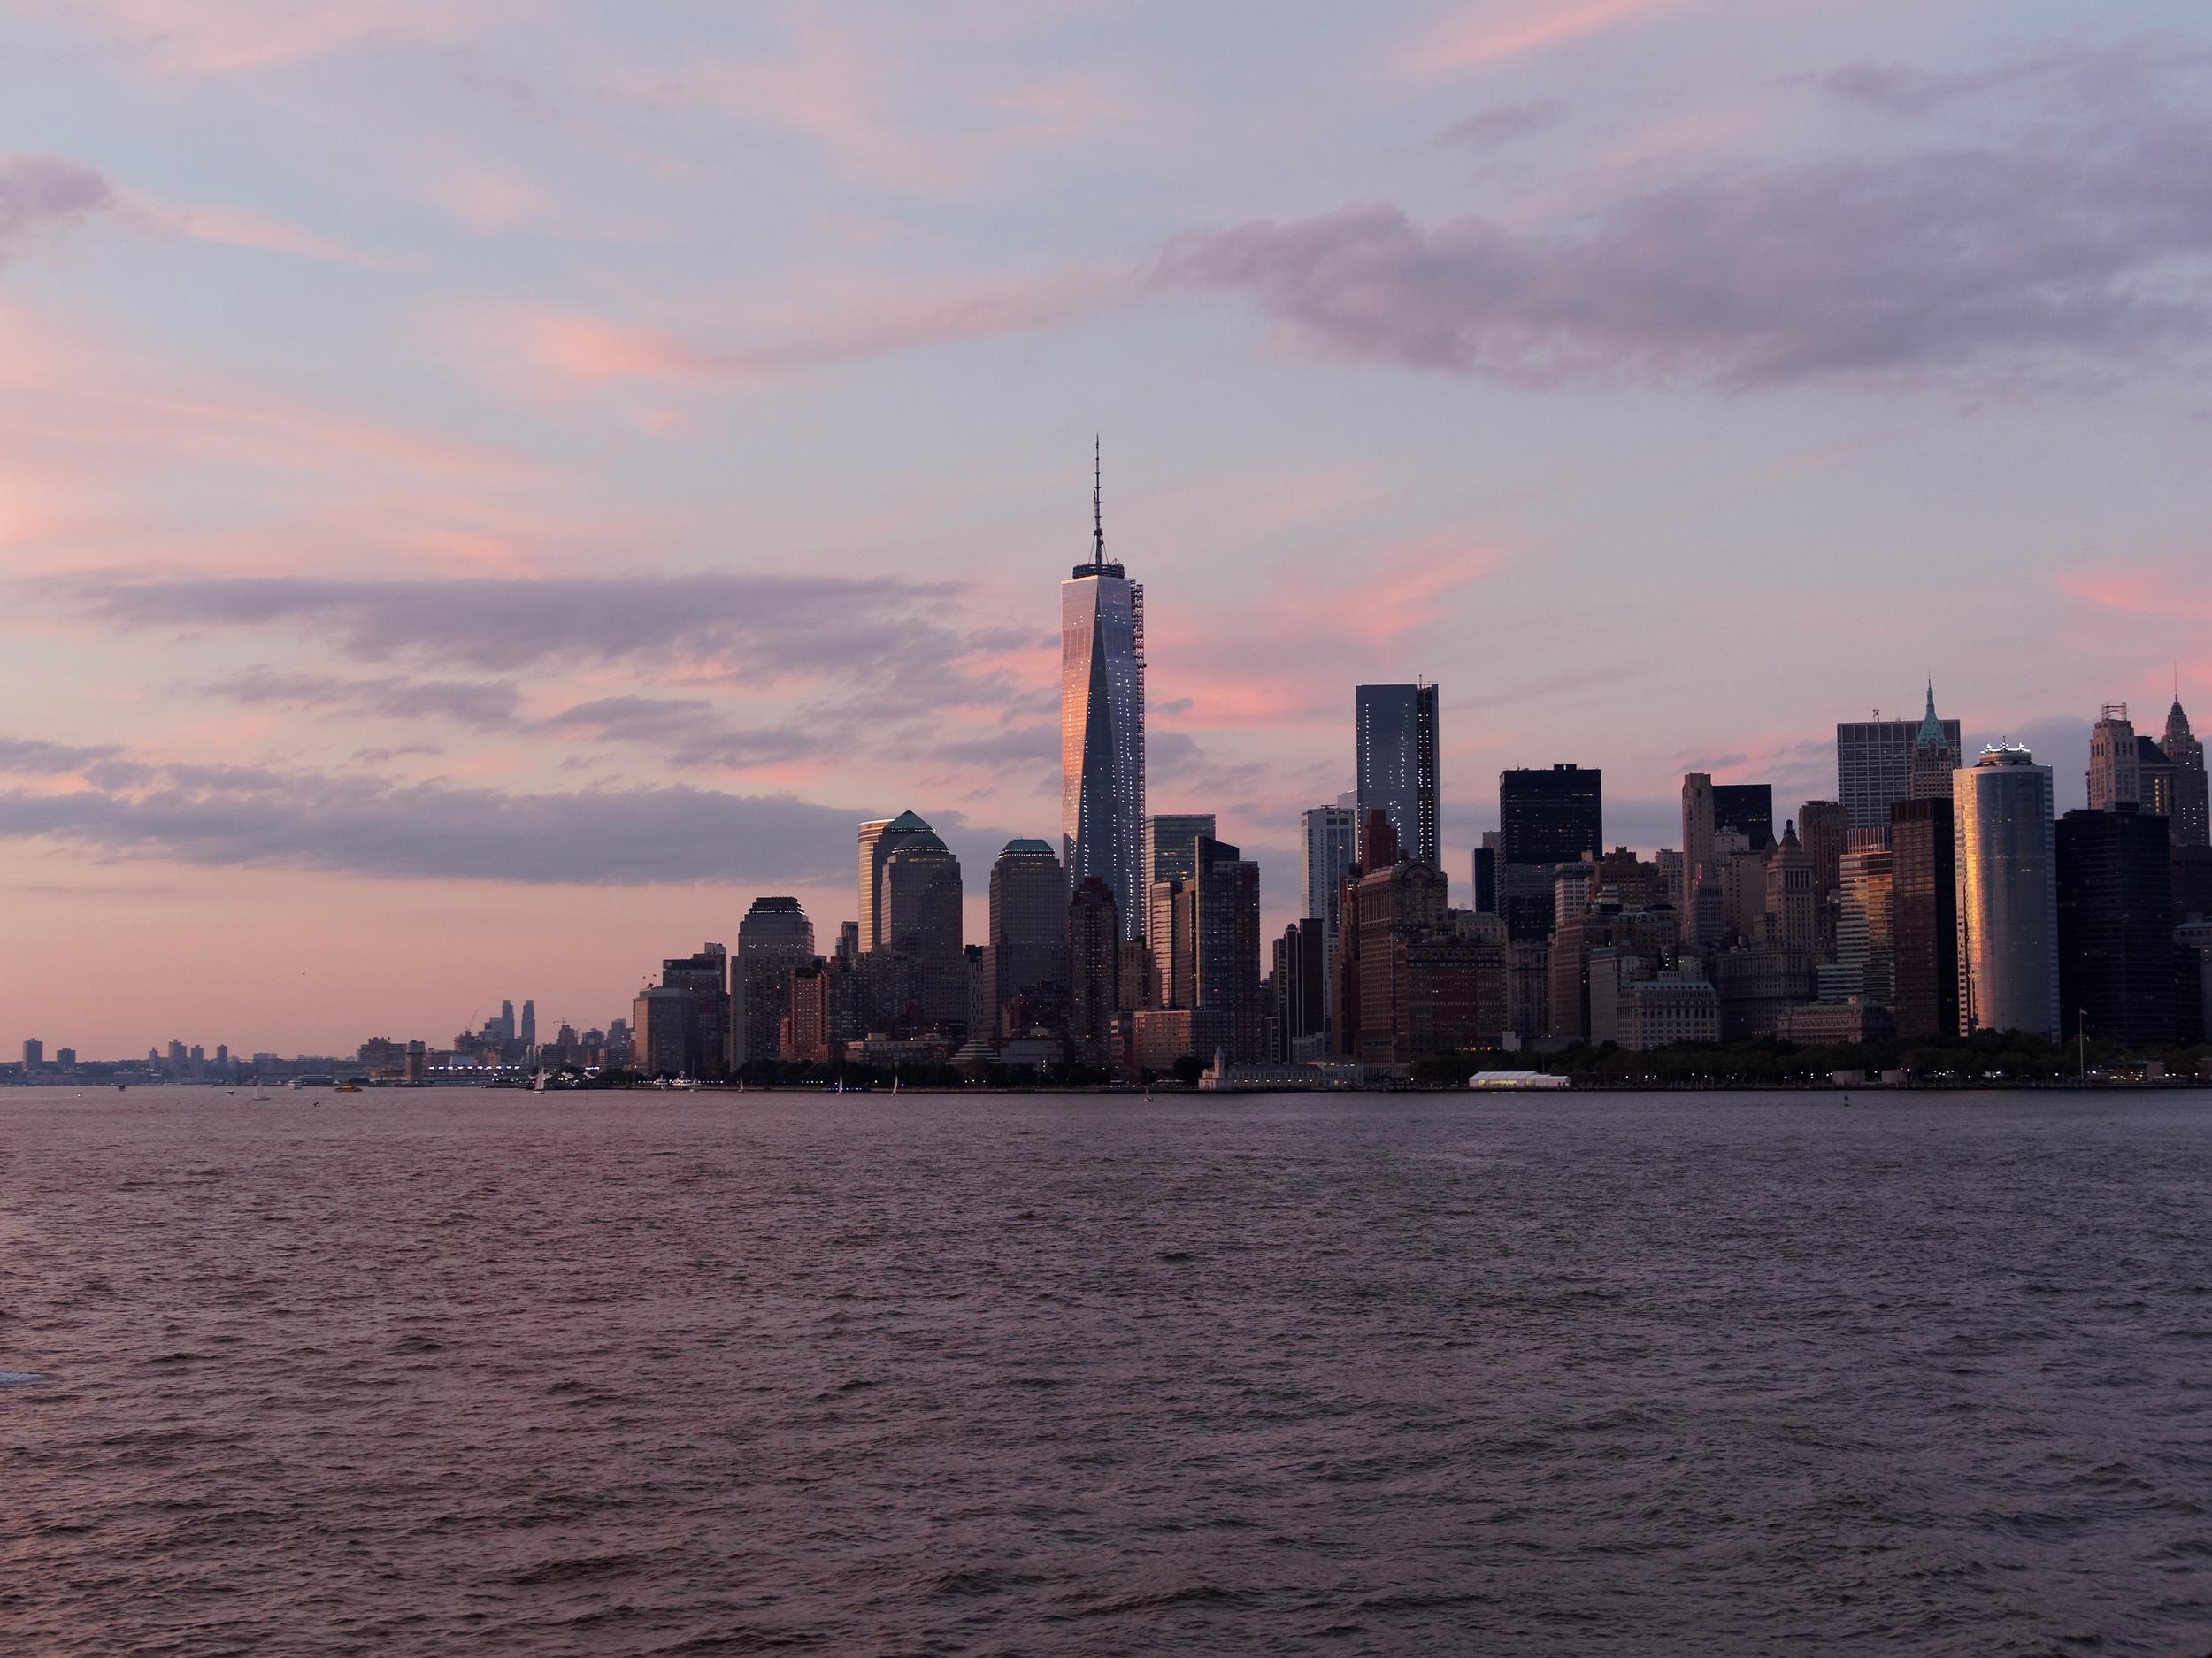 New York City Mediation & Arbitration Group